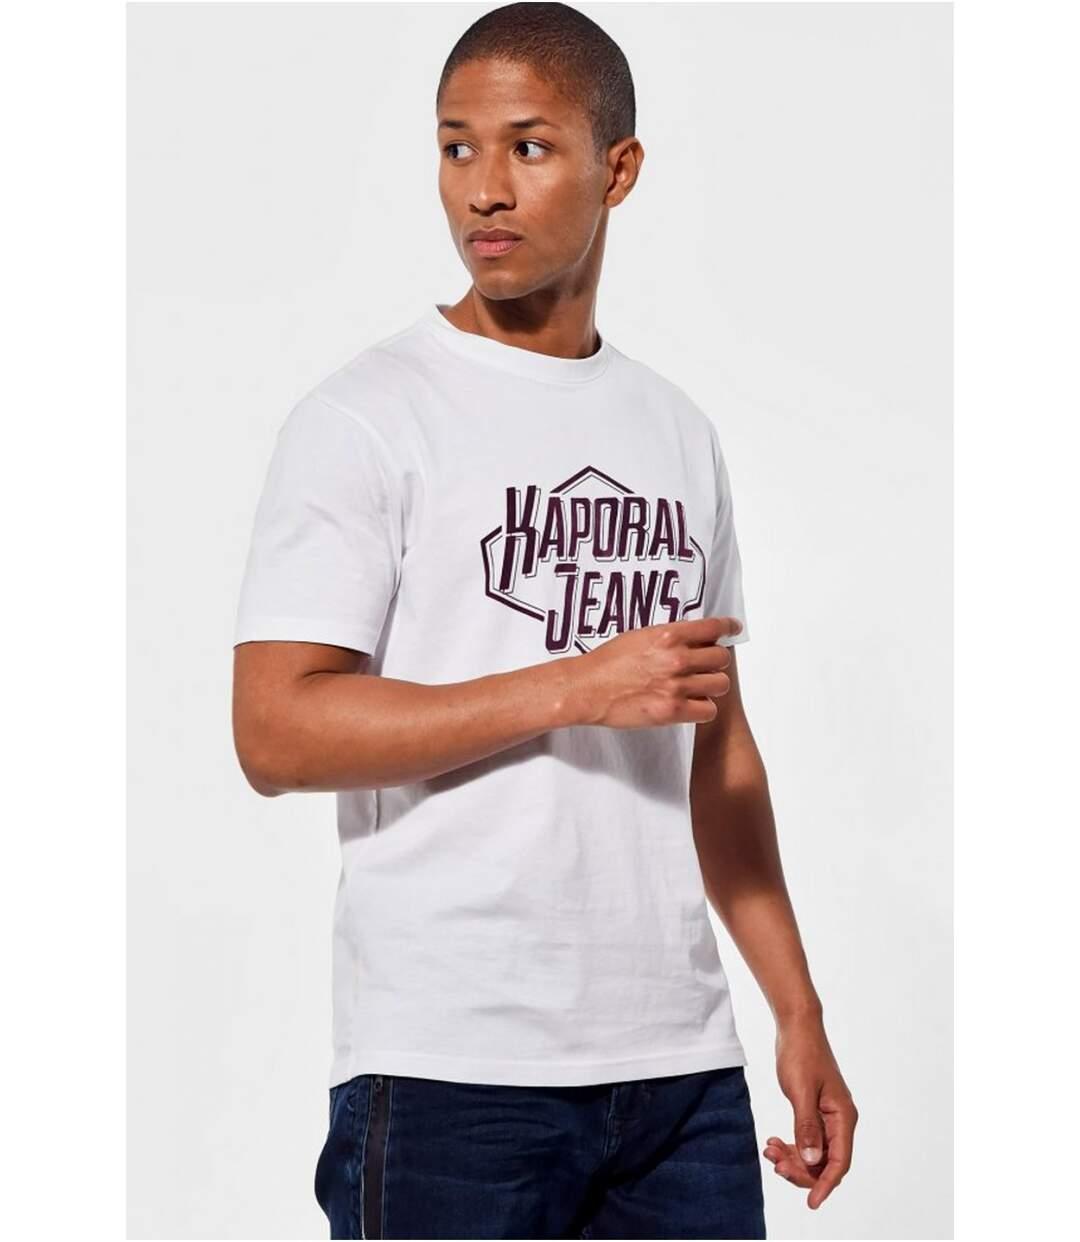 Tee shirt coton bio à gros logo  -  Kaporal - Homme